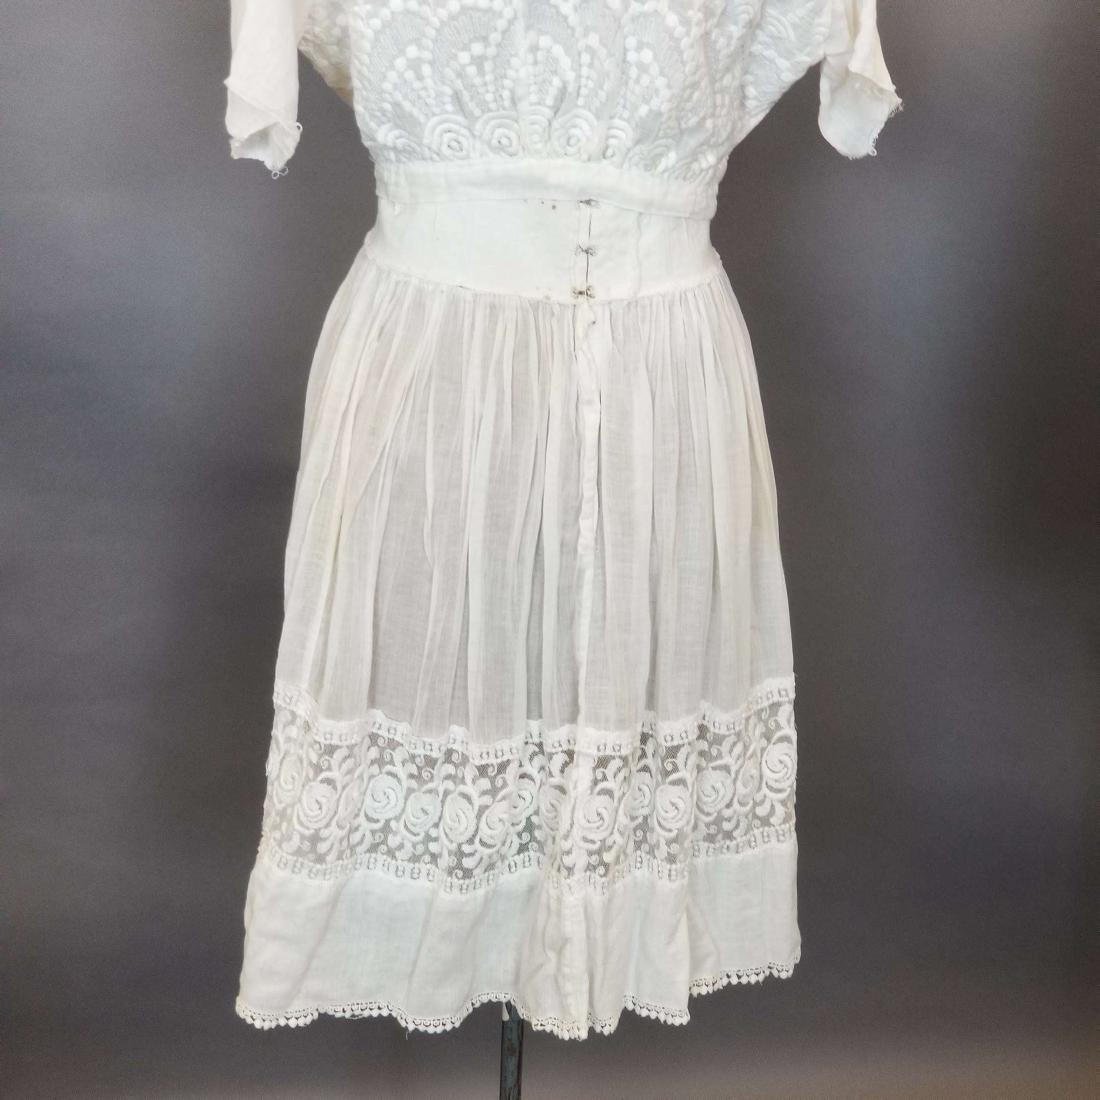 Three Piece White Day Dress - 6